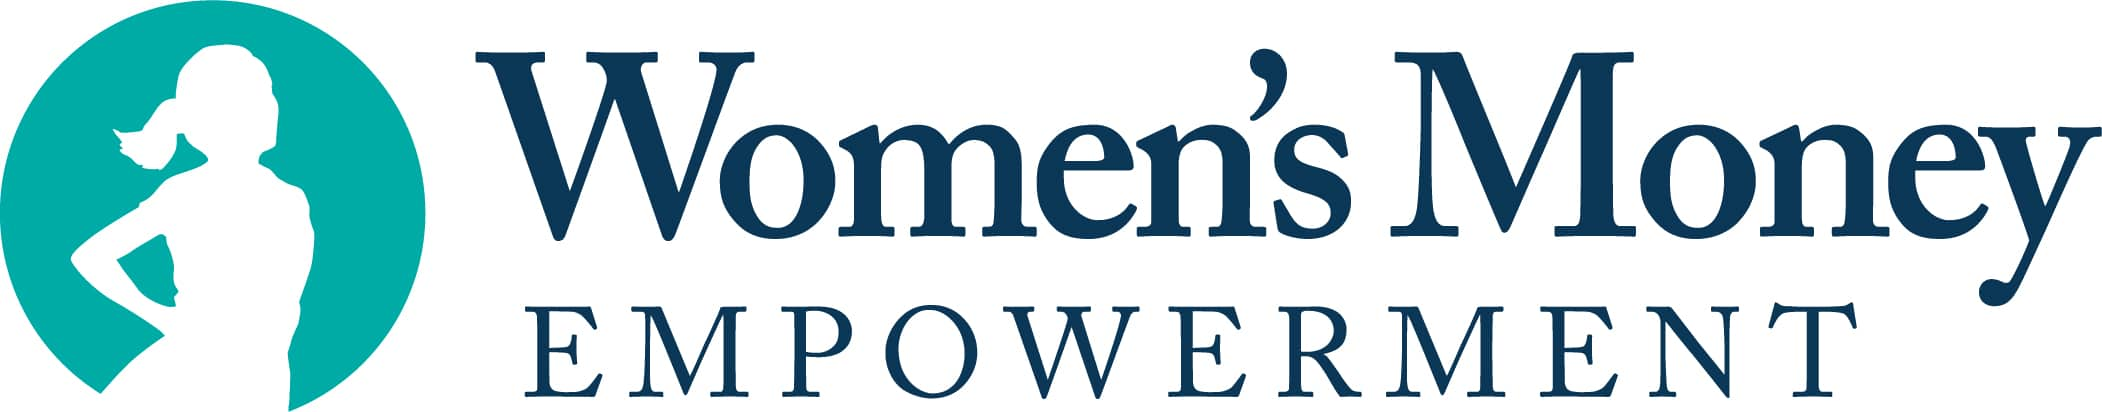 Women's Money Empowerment Sarasota, FL Atlas Fiduciary Financial